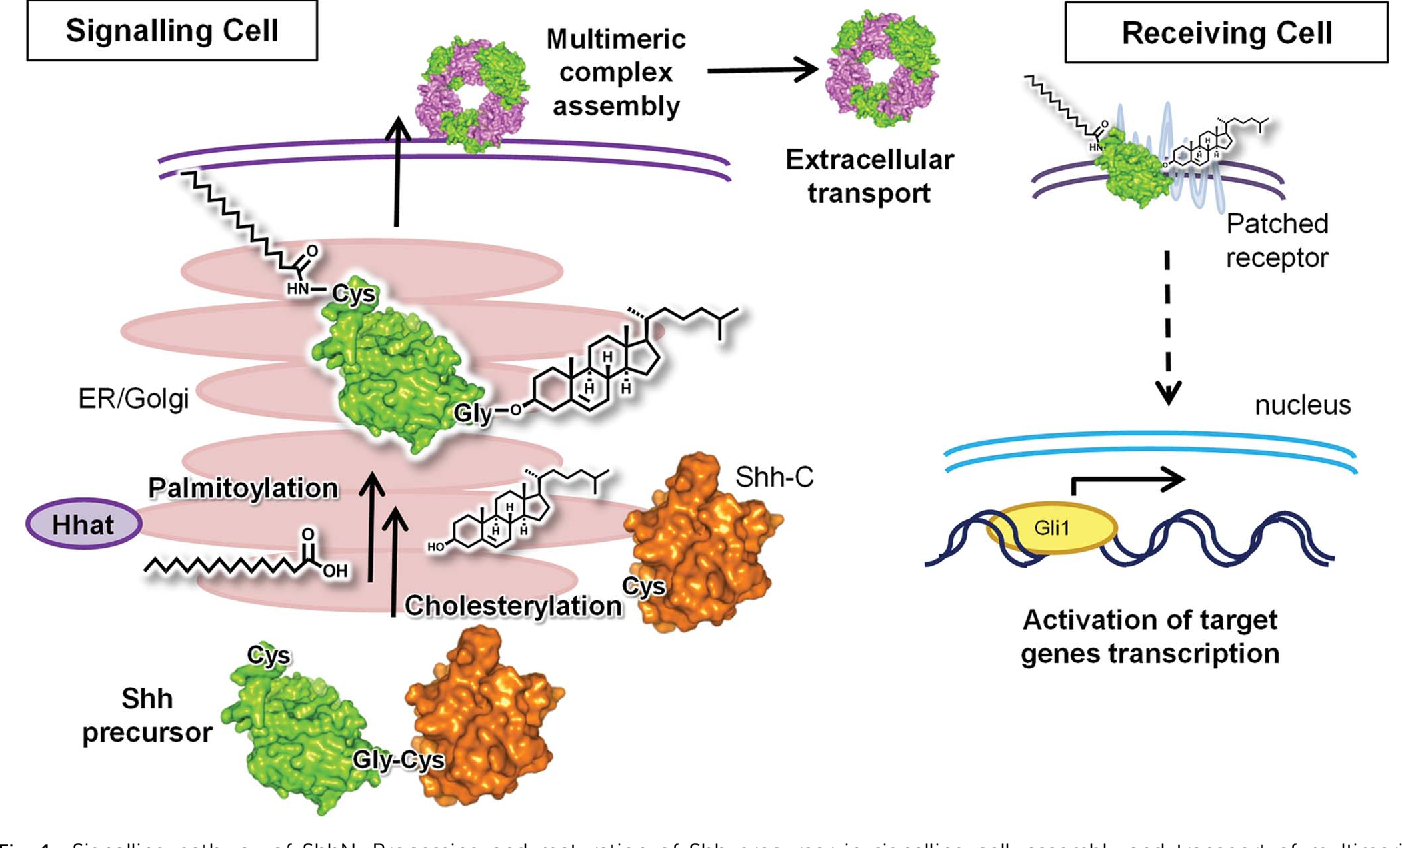 Obes Targeting Cholesterylation Of Sonic Hedgehog In Human Cells And Zebra Fi Sh Semantic Scholar